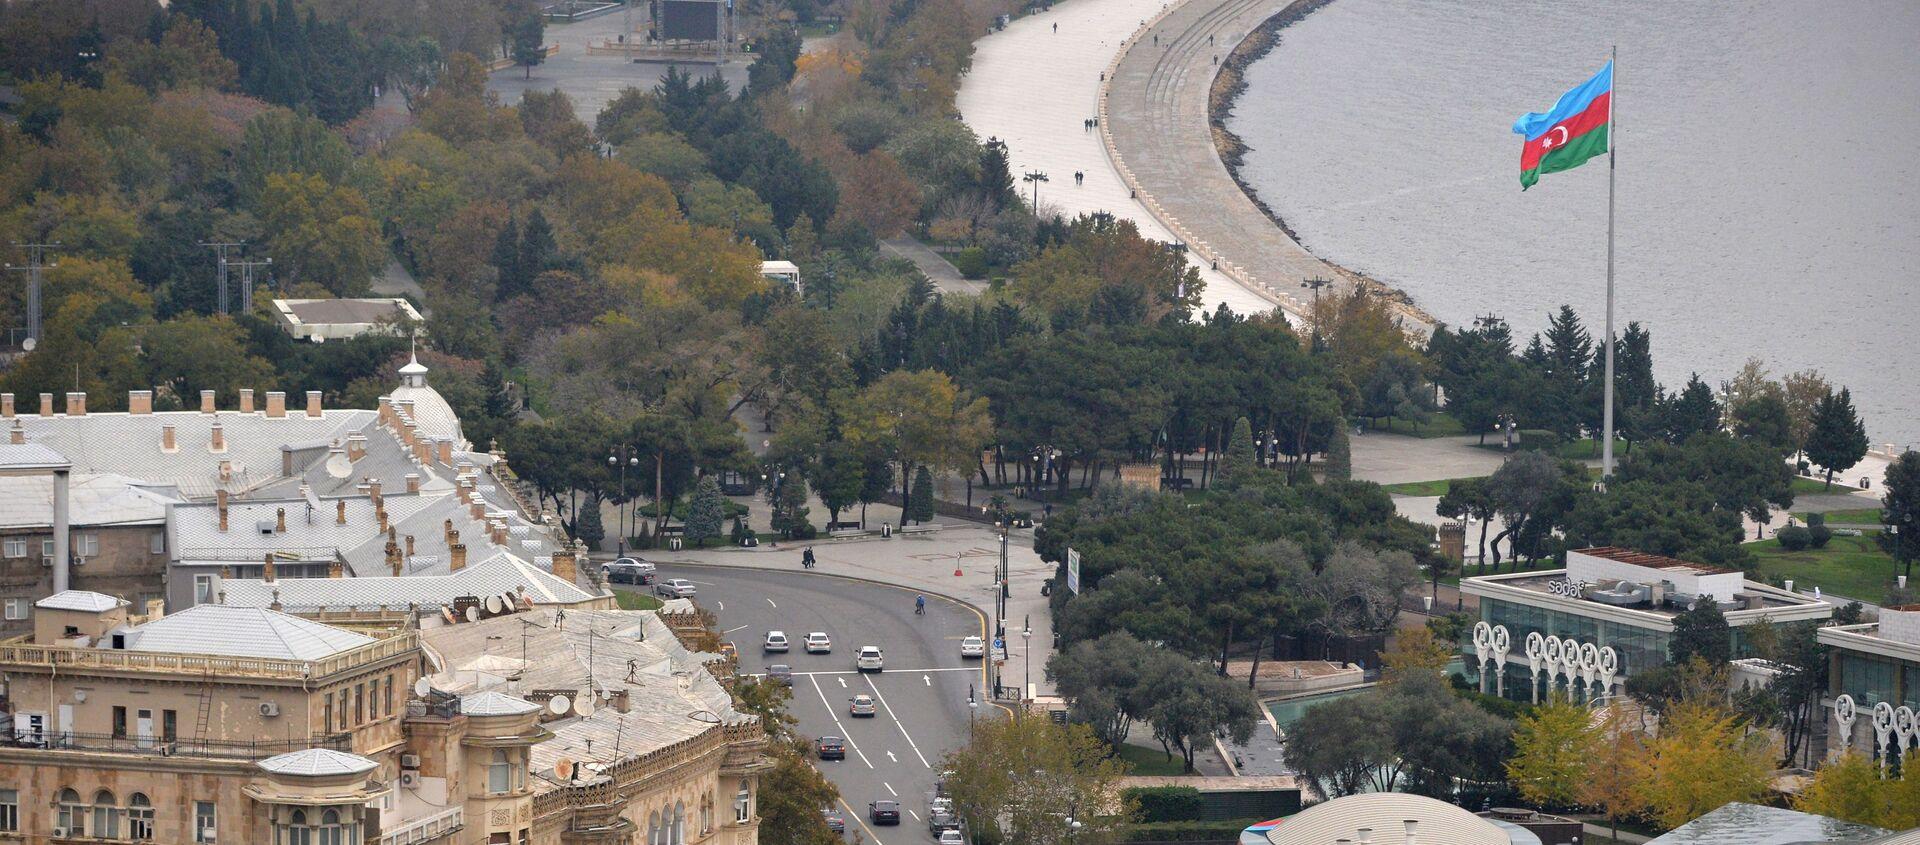 Вид на город со смотровой площадки в Баку - Sputnik Азербайджан, 1920, 20.04.2021